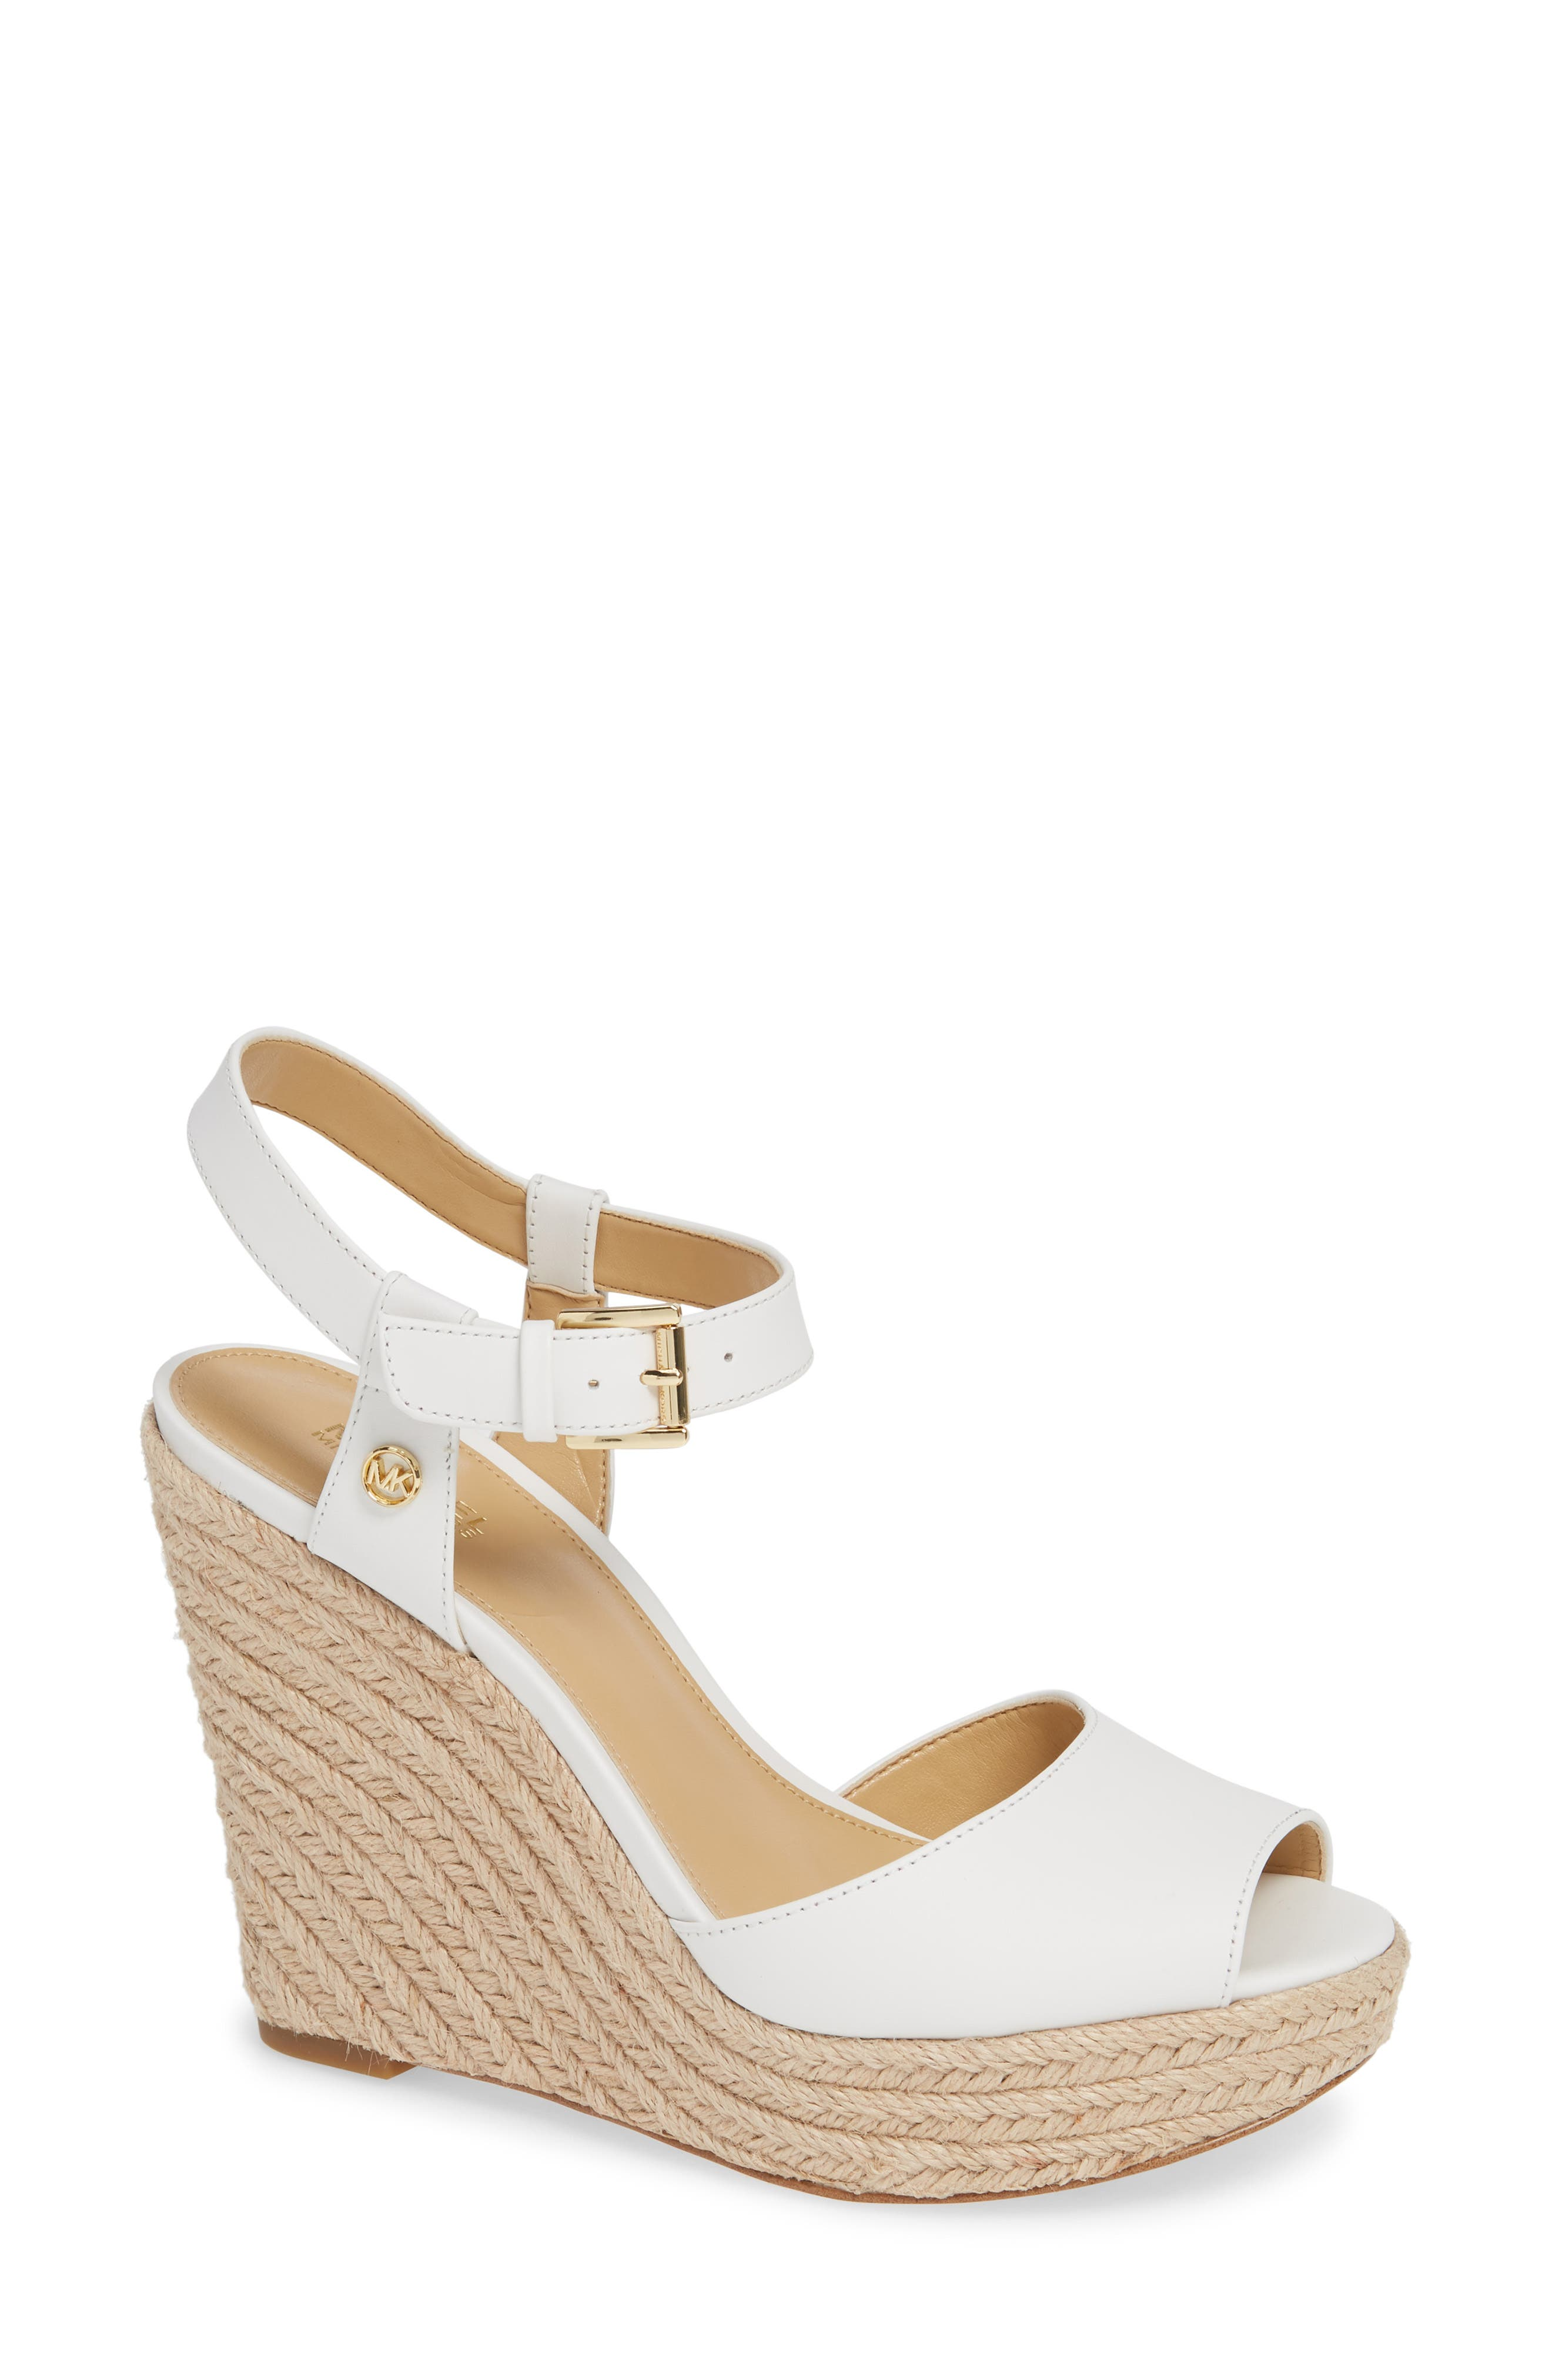 Michael Michael Kors Carlyn Espadrille Wedge Sandal, White